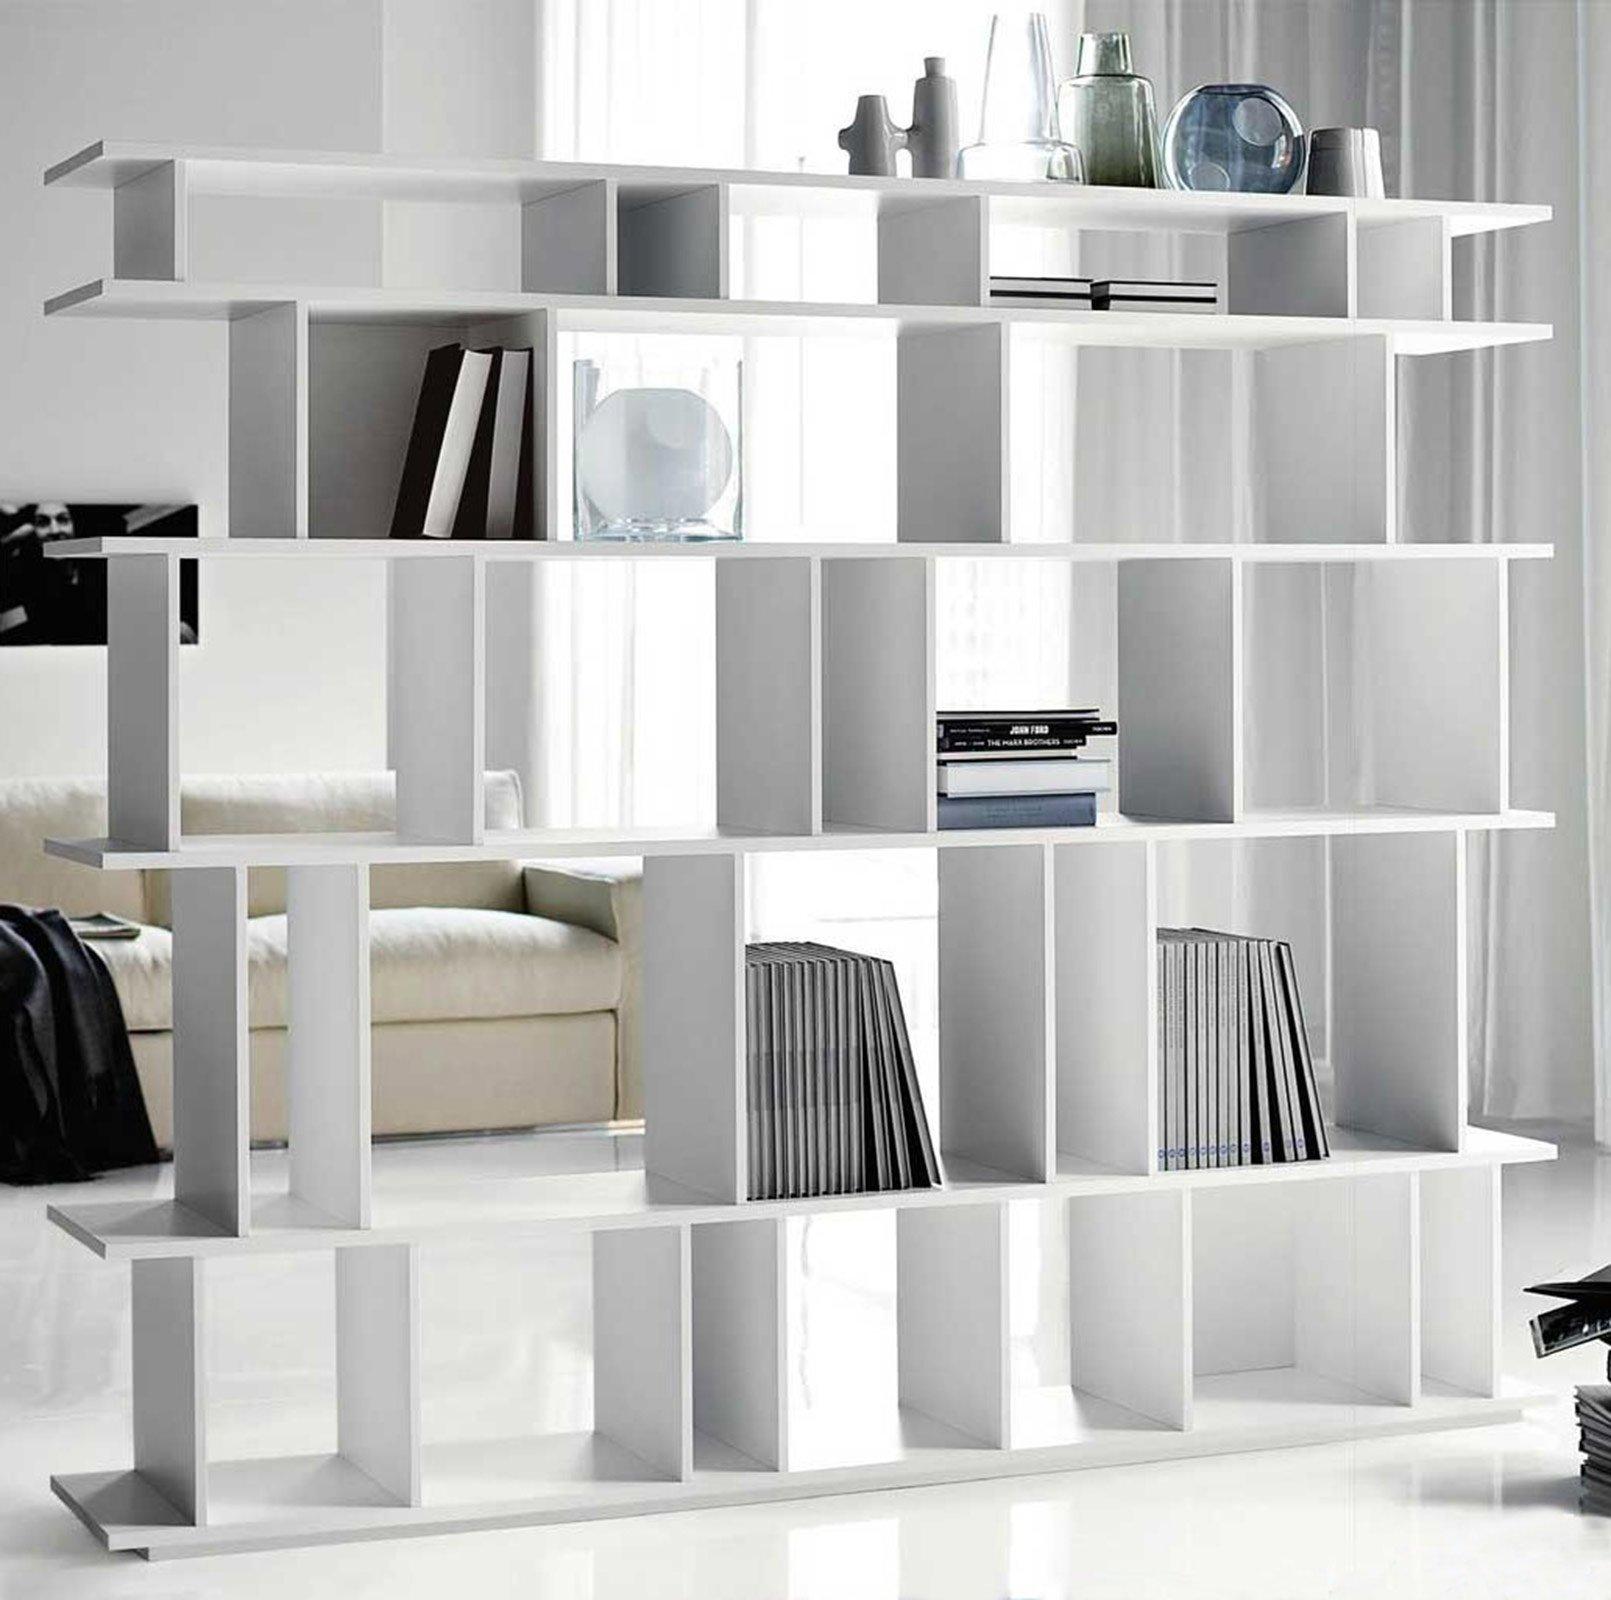 Librerie bifacciali per separare ambienti cose di casa - Parete attrezzata ikea cubi ...